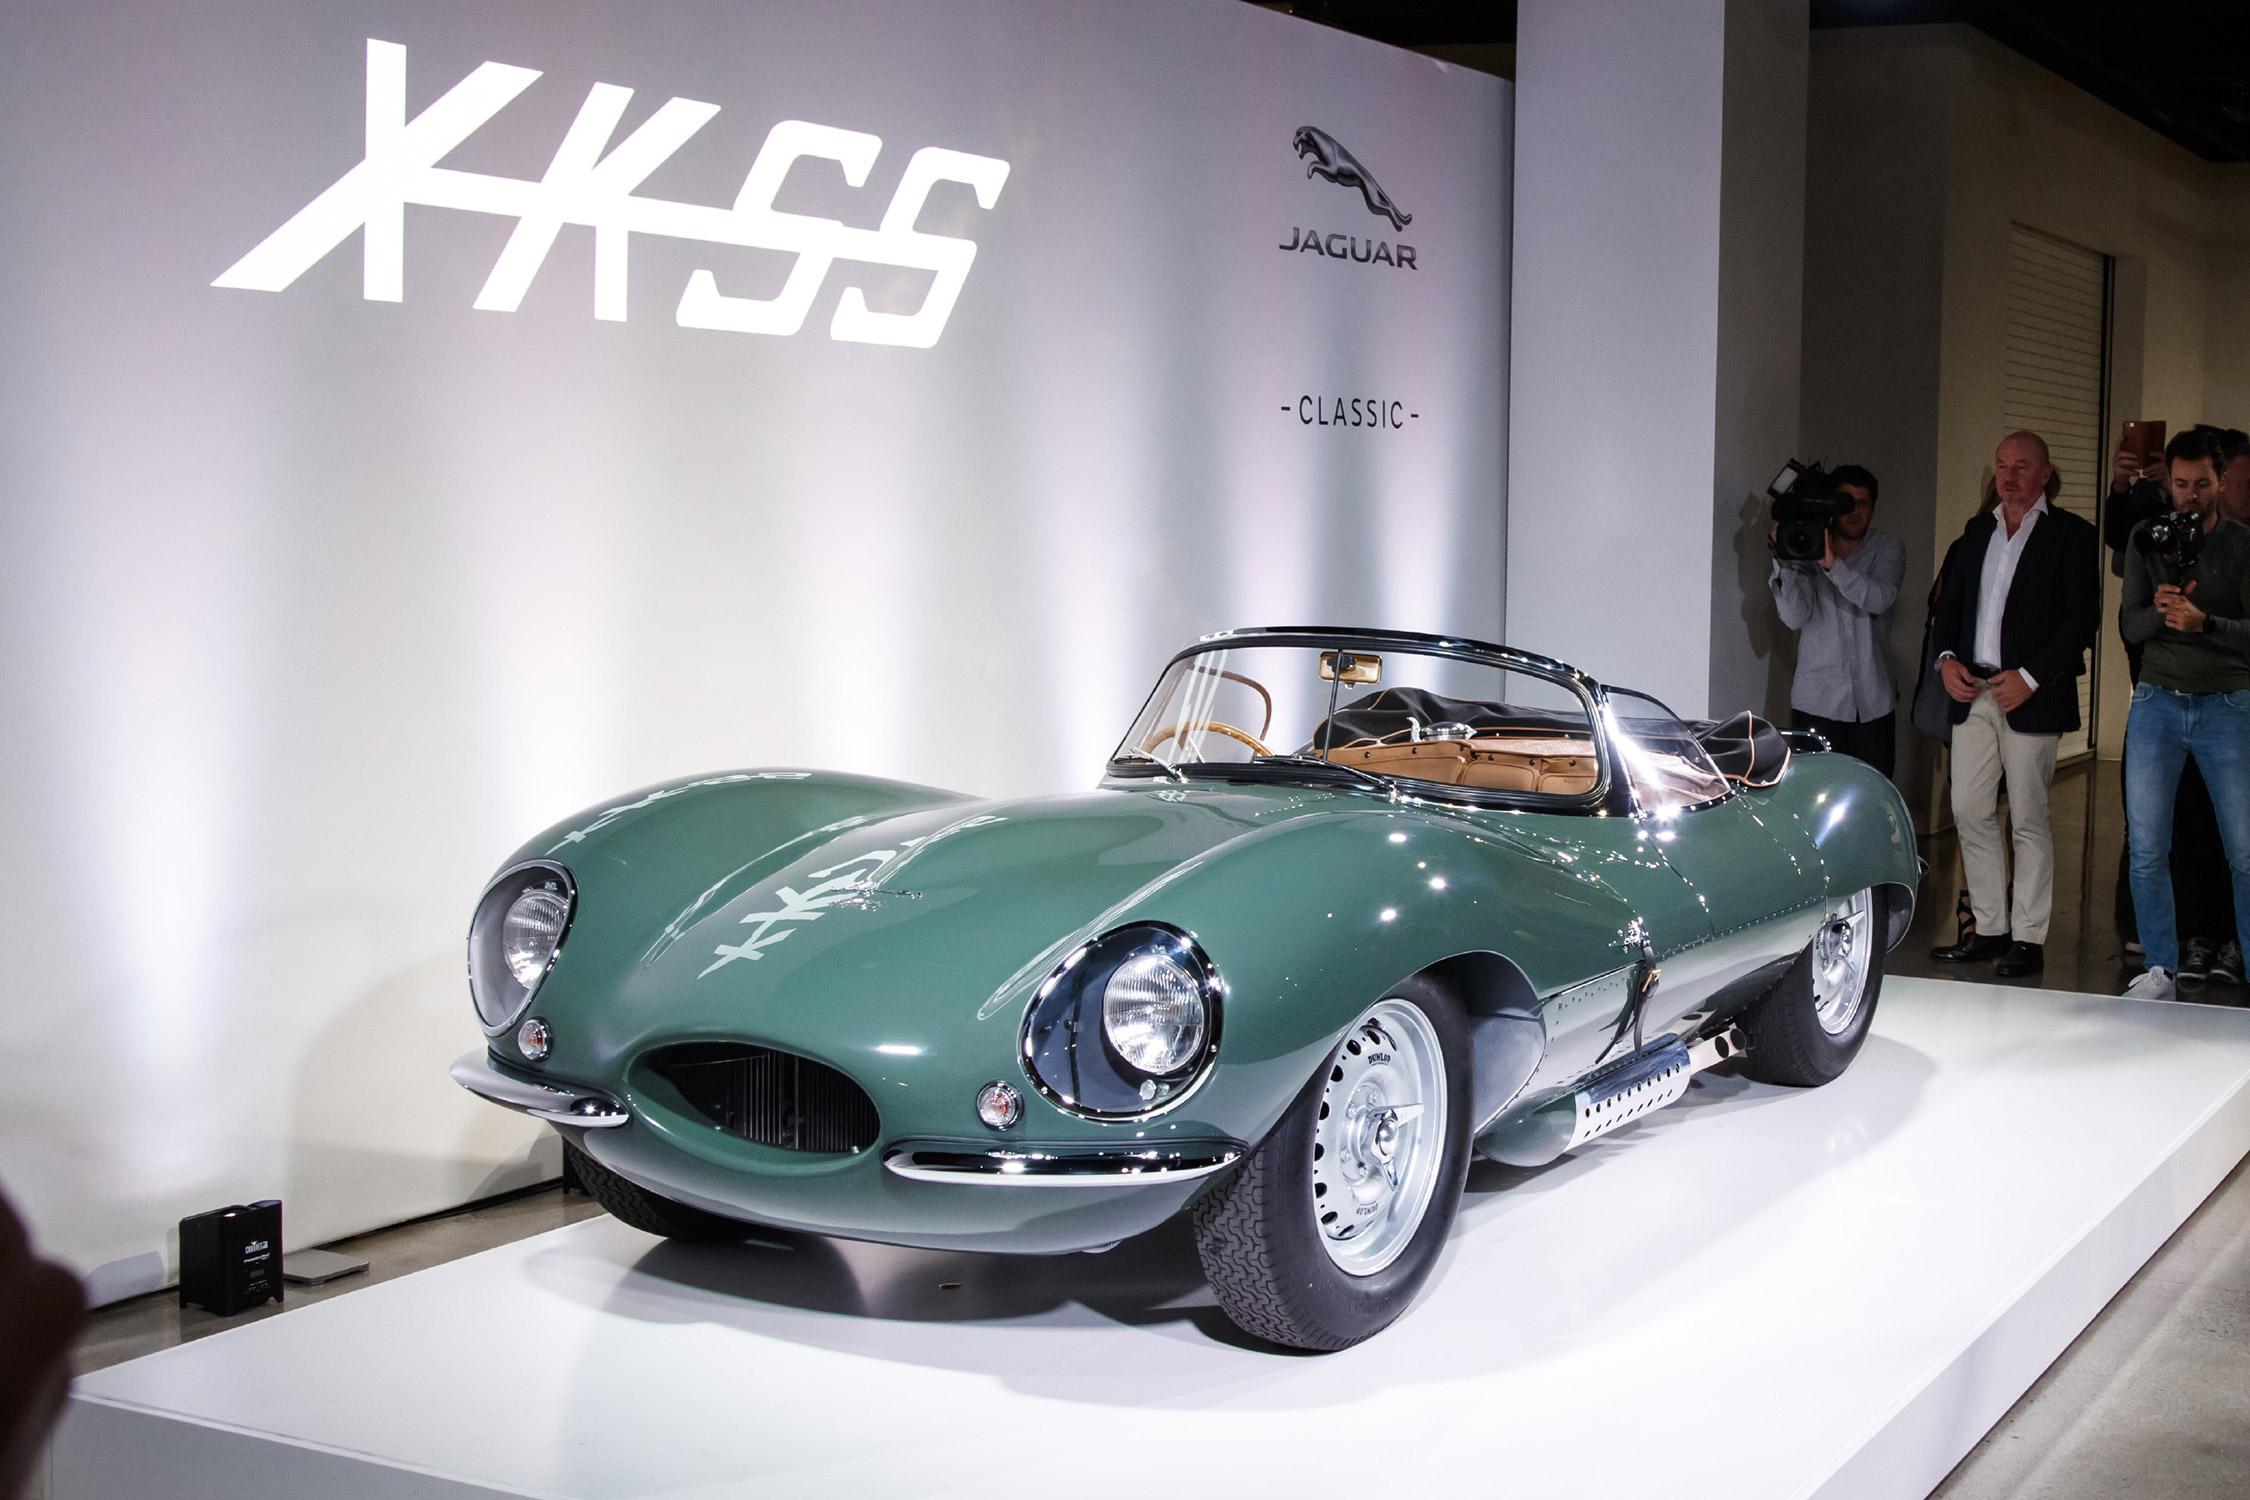 Image 8 Of 42 1957 Jaguar Xkss For Sale Wiring Diagrams Repair 1954 Xk120 Diagram Photo Recreation Cabriolet 2018 Mdiatheque